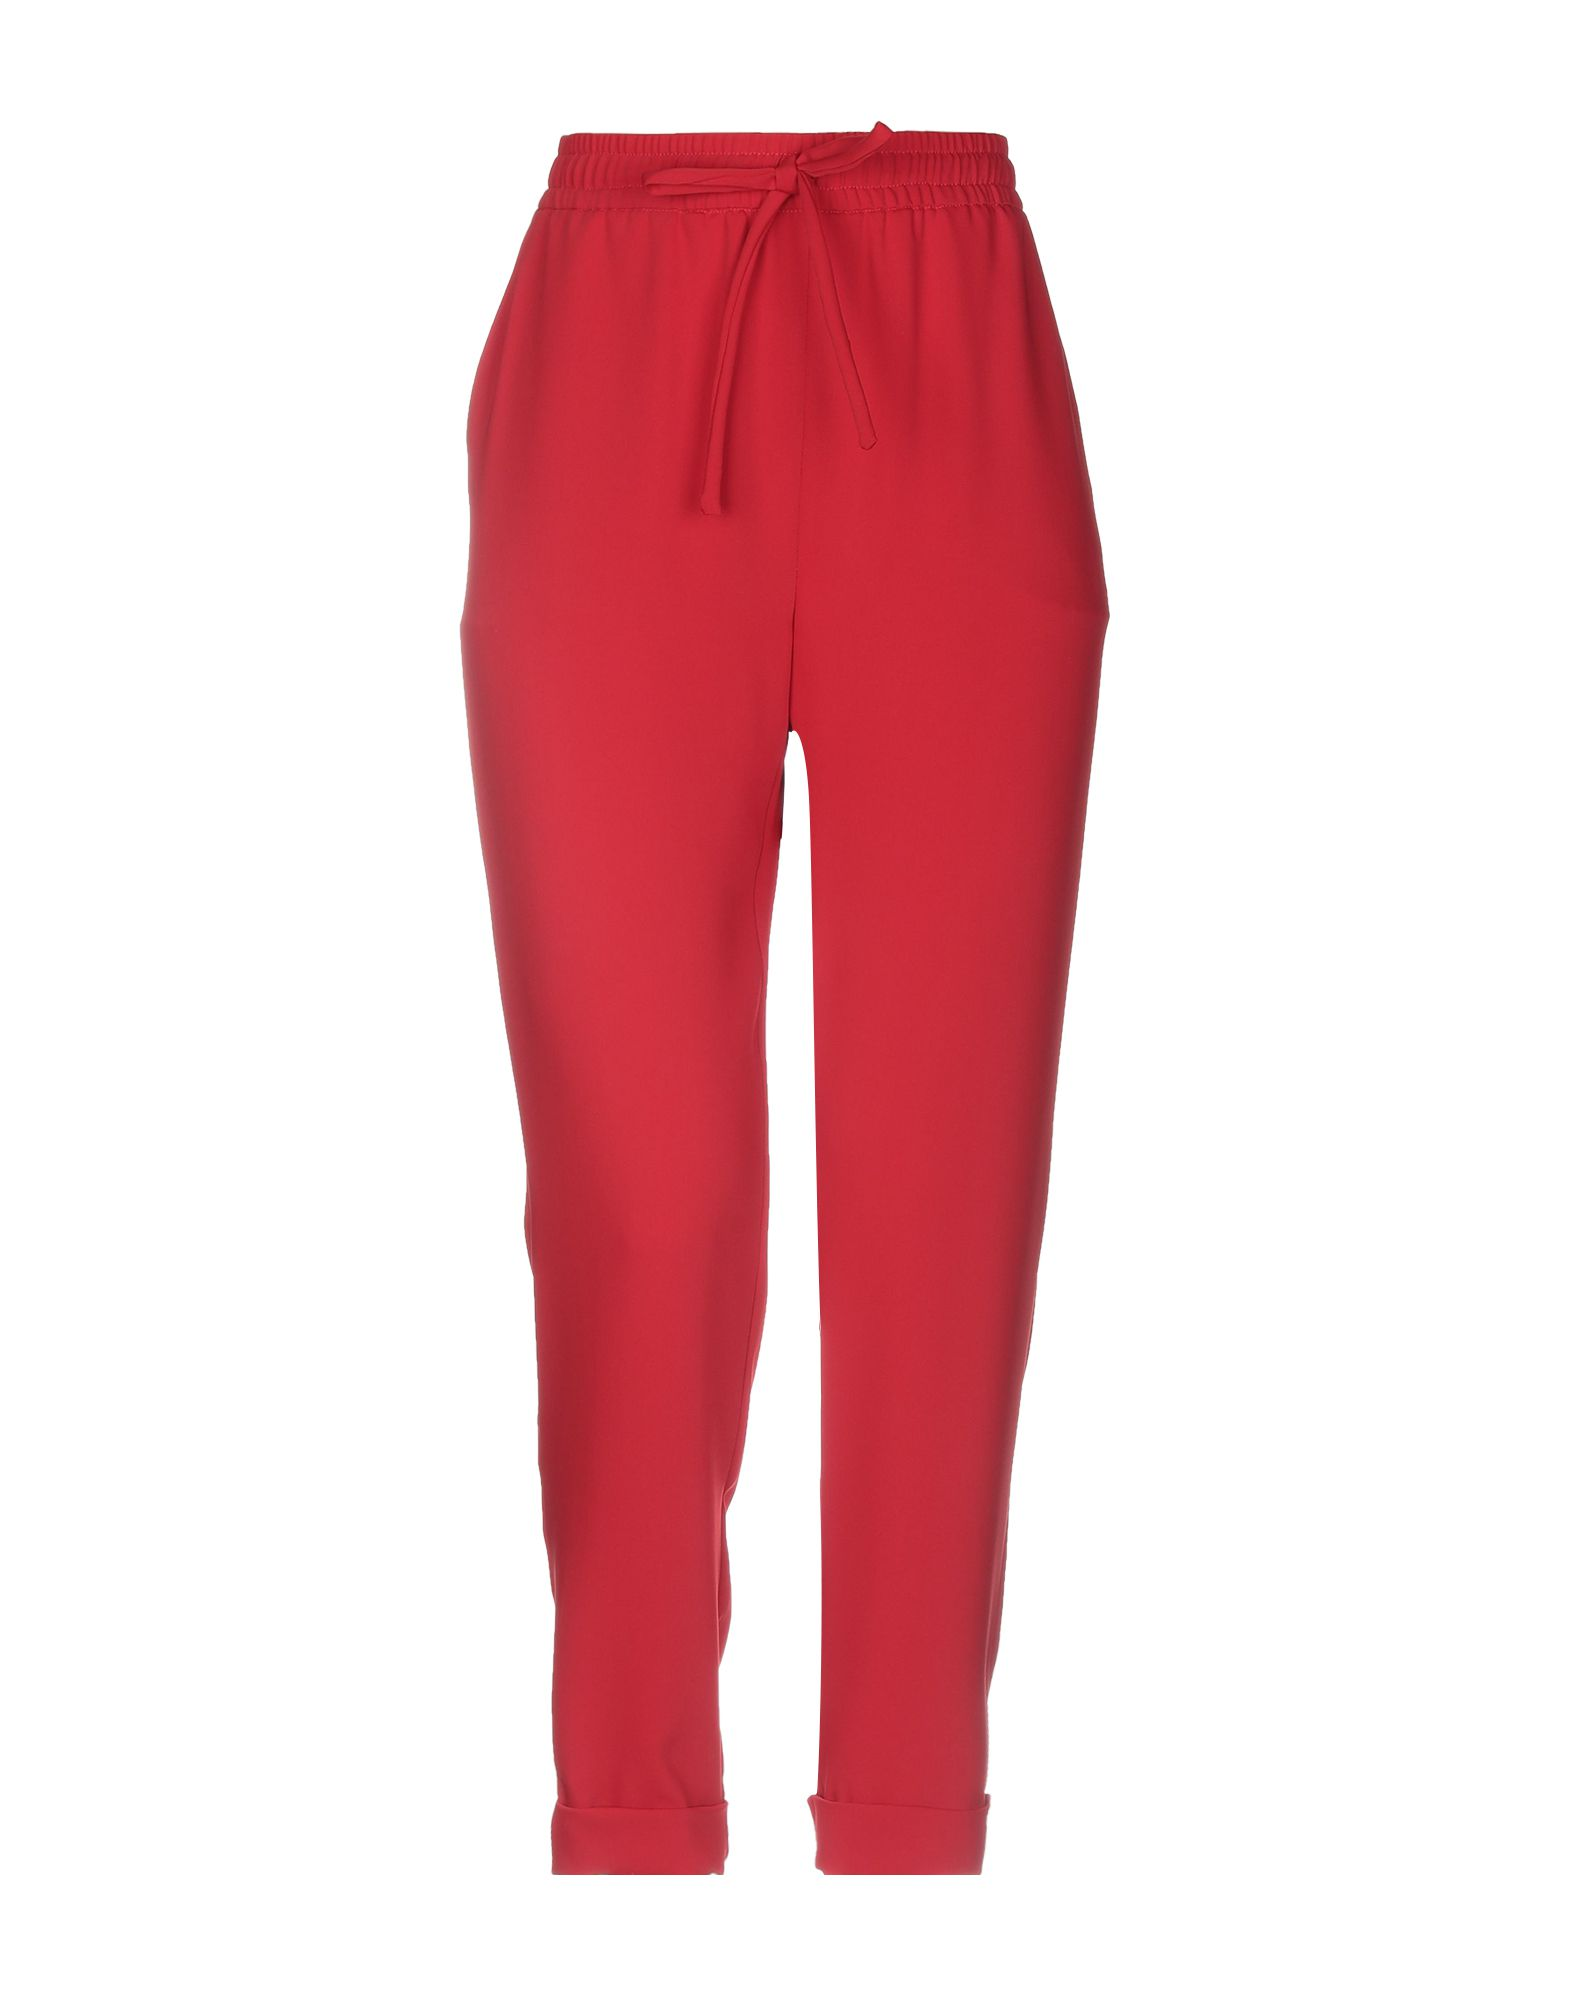 Pantalone P.A.R.O.S.H. donna - - 13250504PF  ausgezeichnete preise